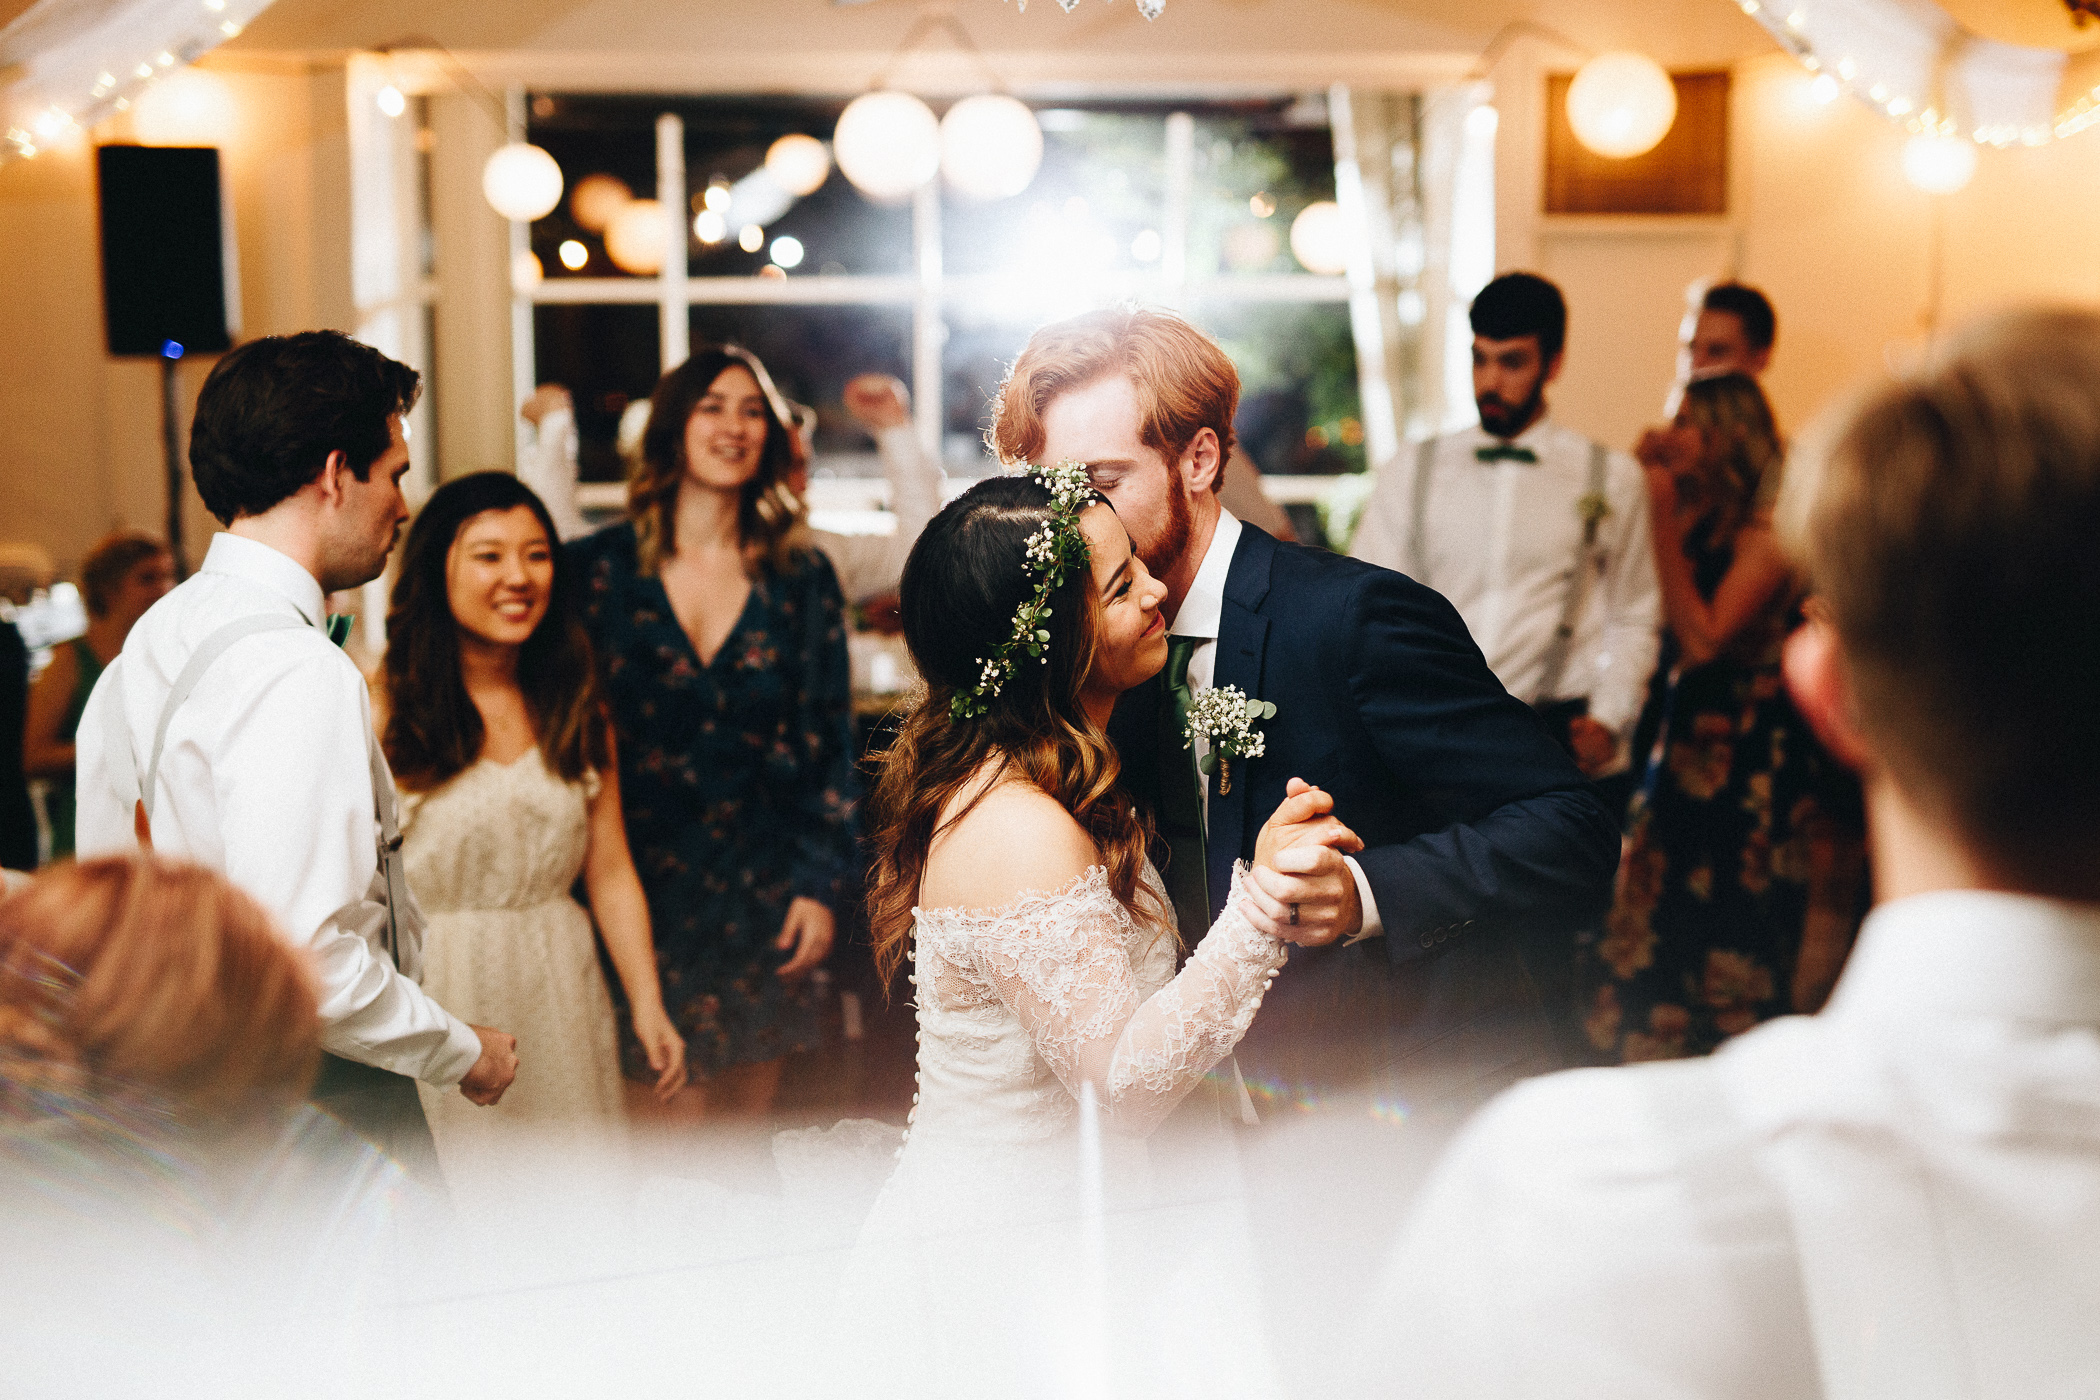 181104-Luxium-Weddings-Arizona-@matt__Le-Brandon-Kariana-Phoenix-Valley-Garden-Center-1145.jpg